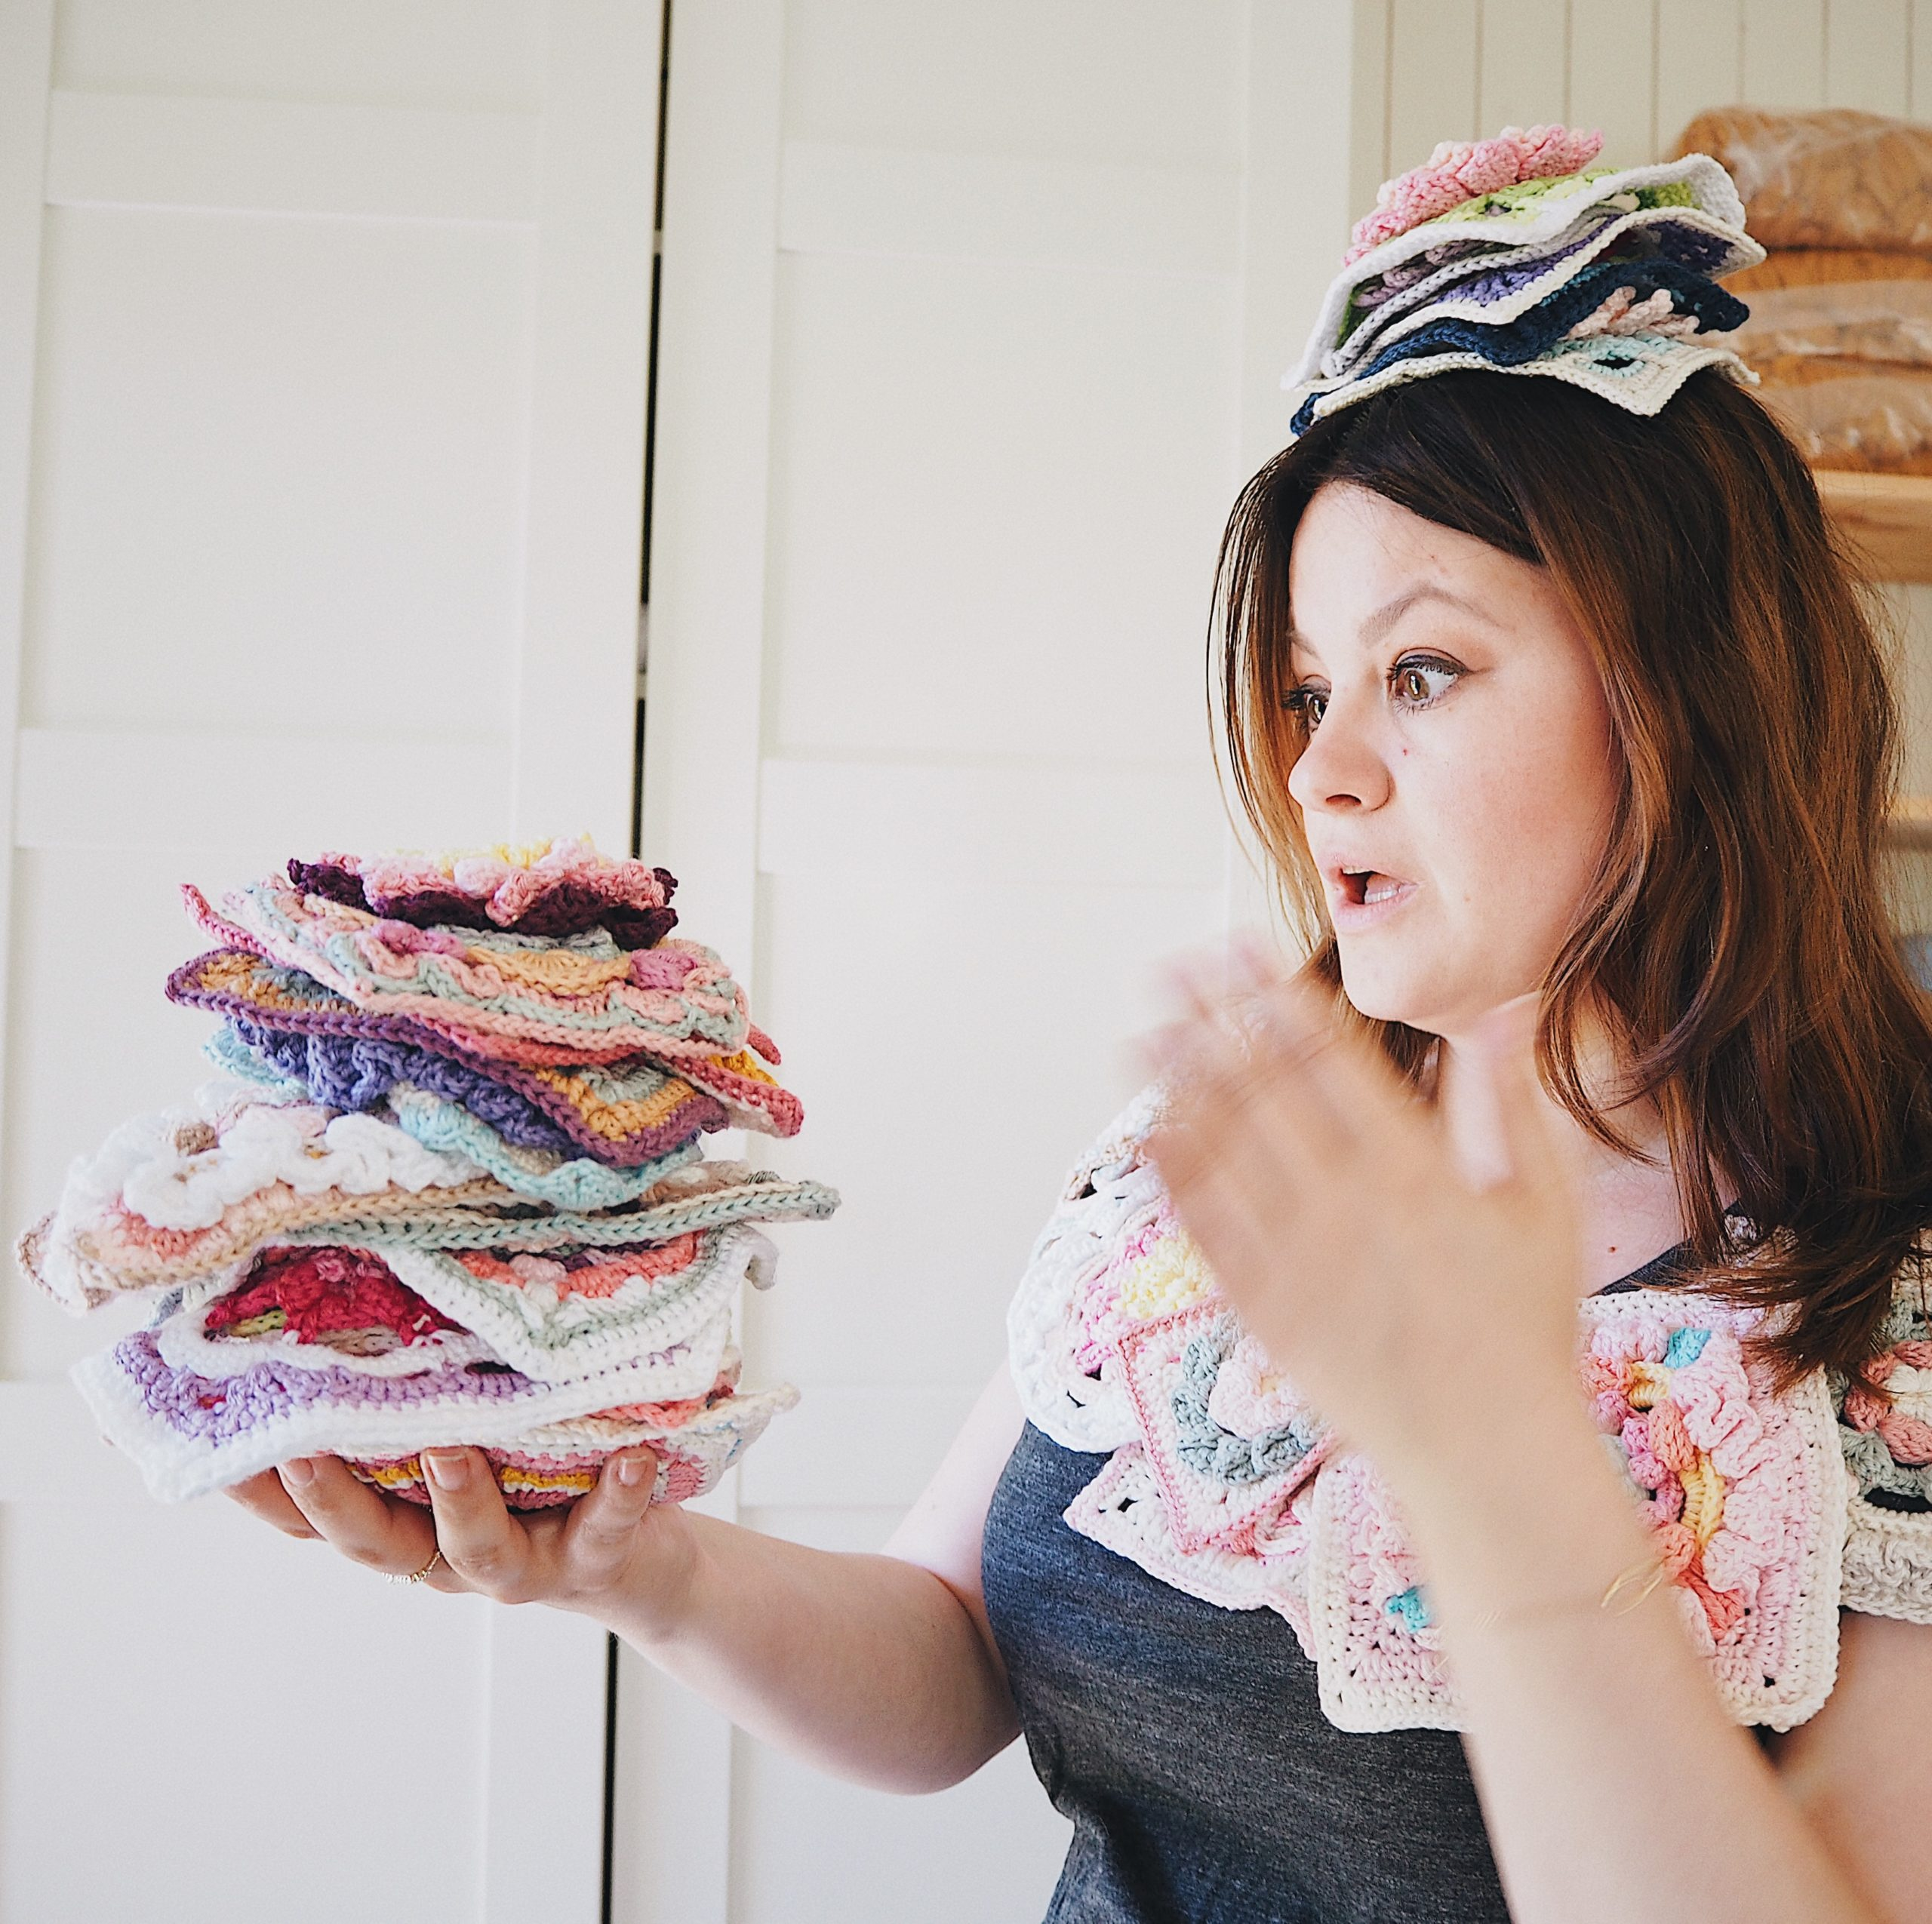 Romantic-Granny-Square-Therese-Eghult-SistersInStitch-The-Ultimate-Granny-Square-Sourcebook-Crochetedbytess